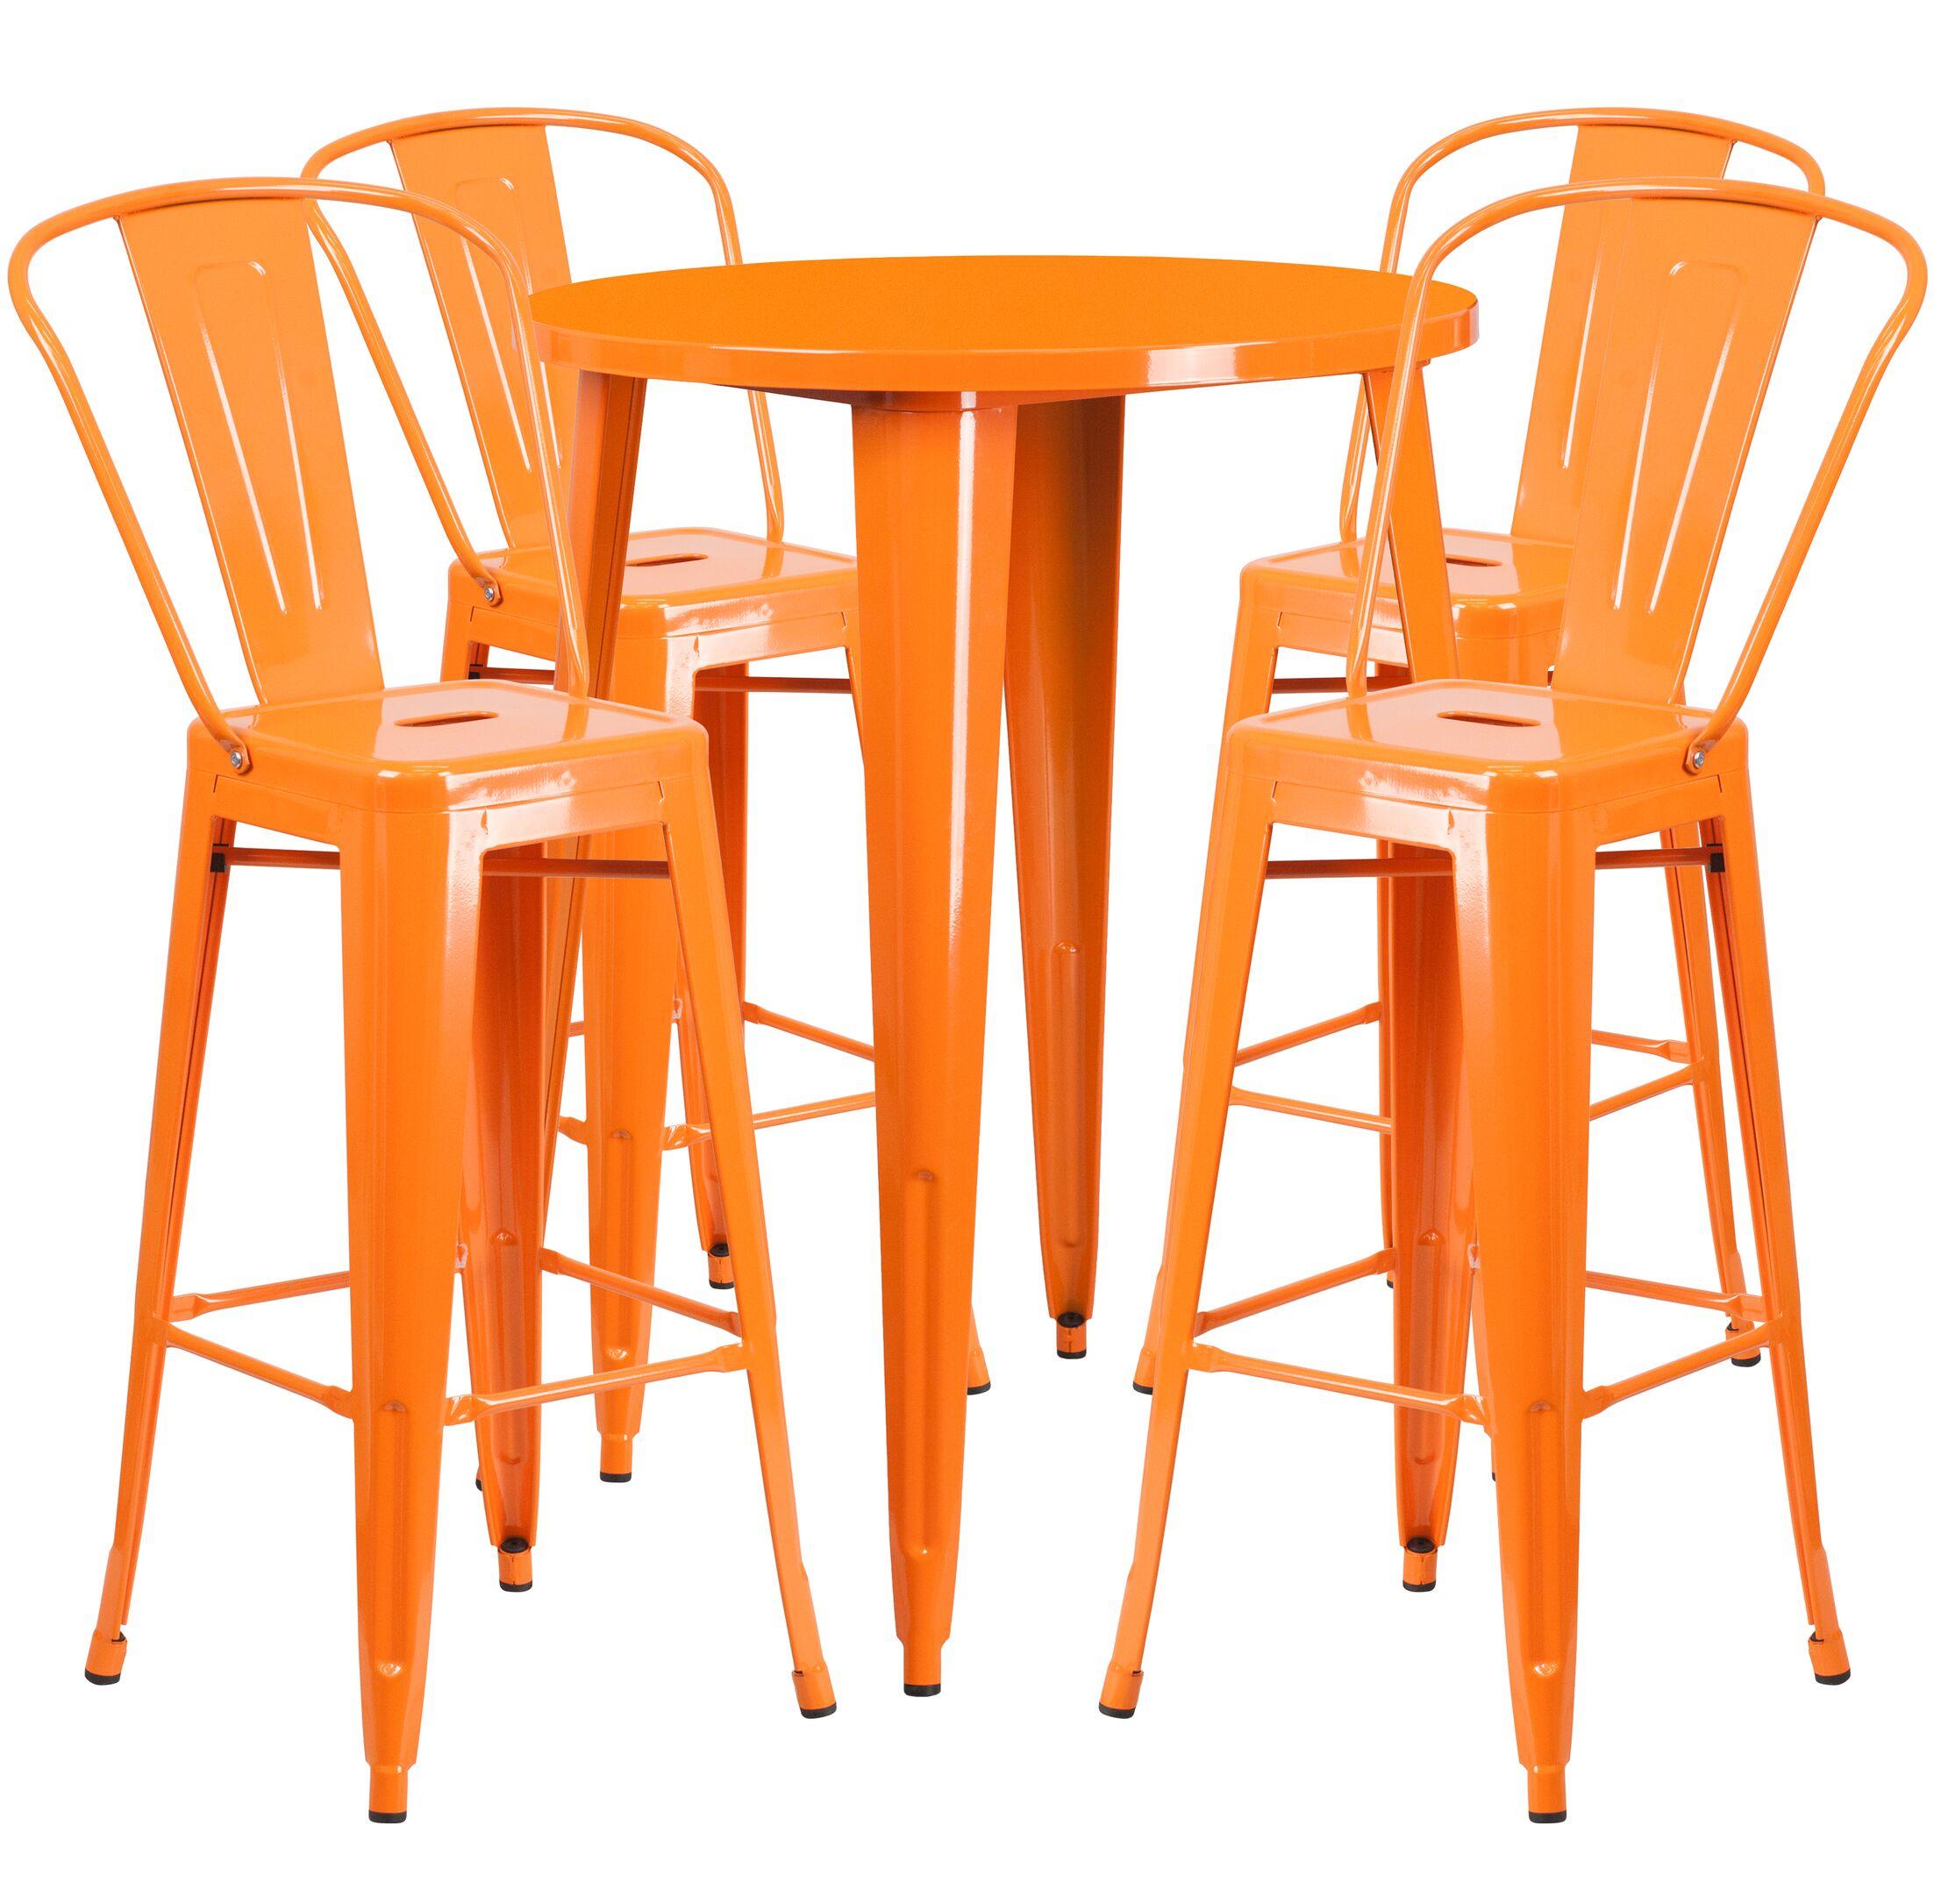 Bowdon 5 Piece Bar Height Dining Set Finish: Orange